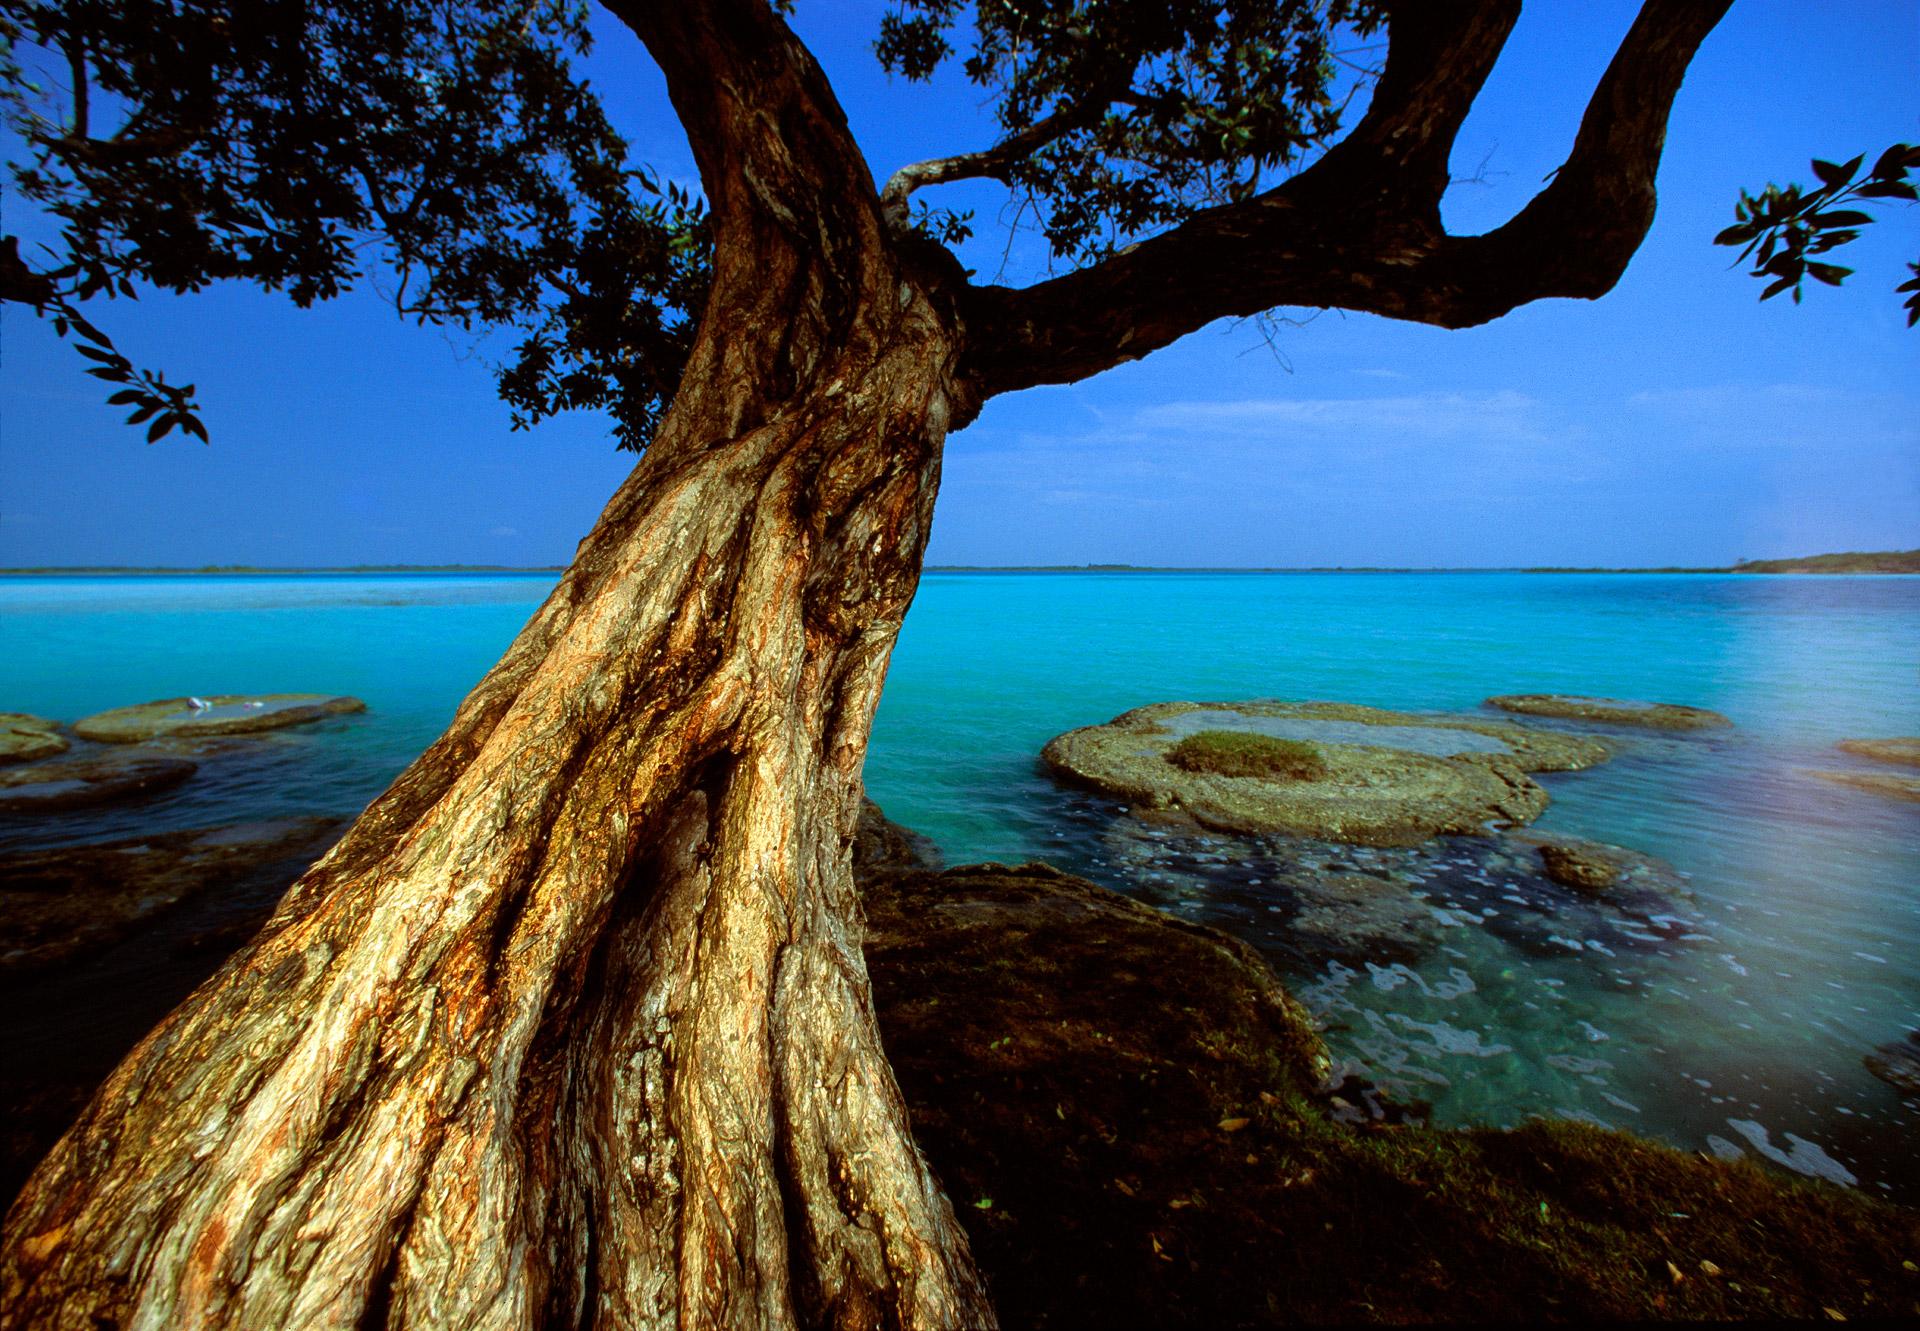 Tree at Lago Bacalar in Yucatan, Mexico